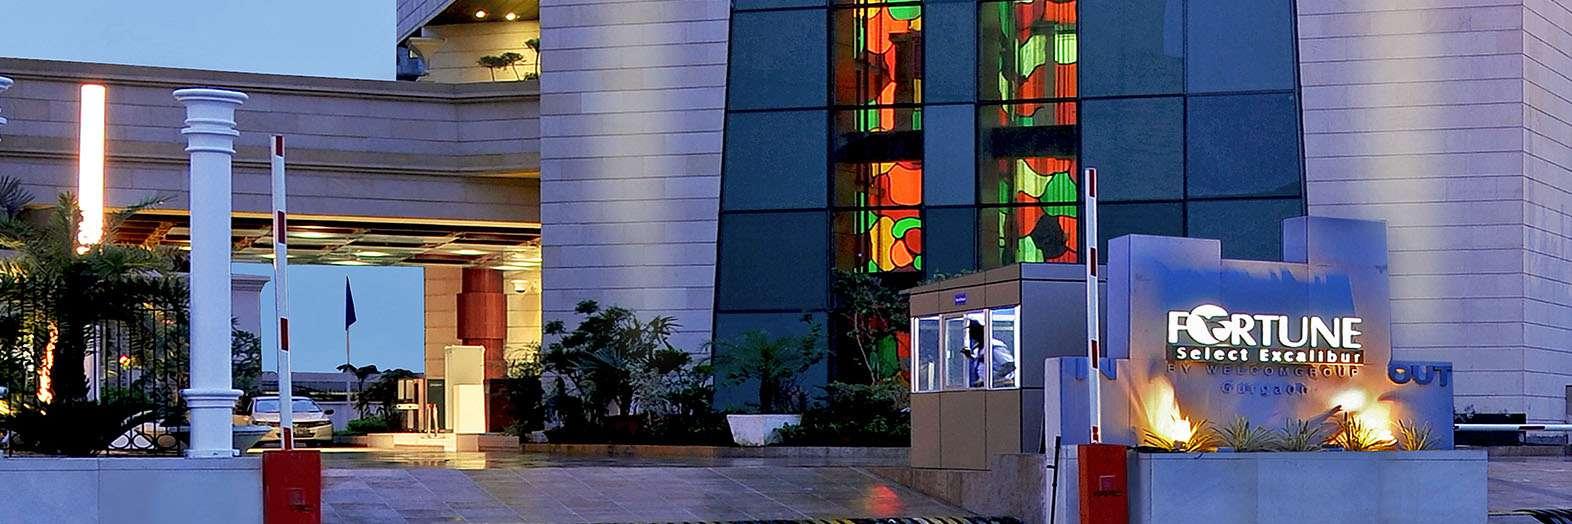 Fortune Select Excalibur, Sohna Road, Gurgaon